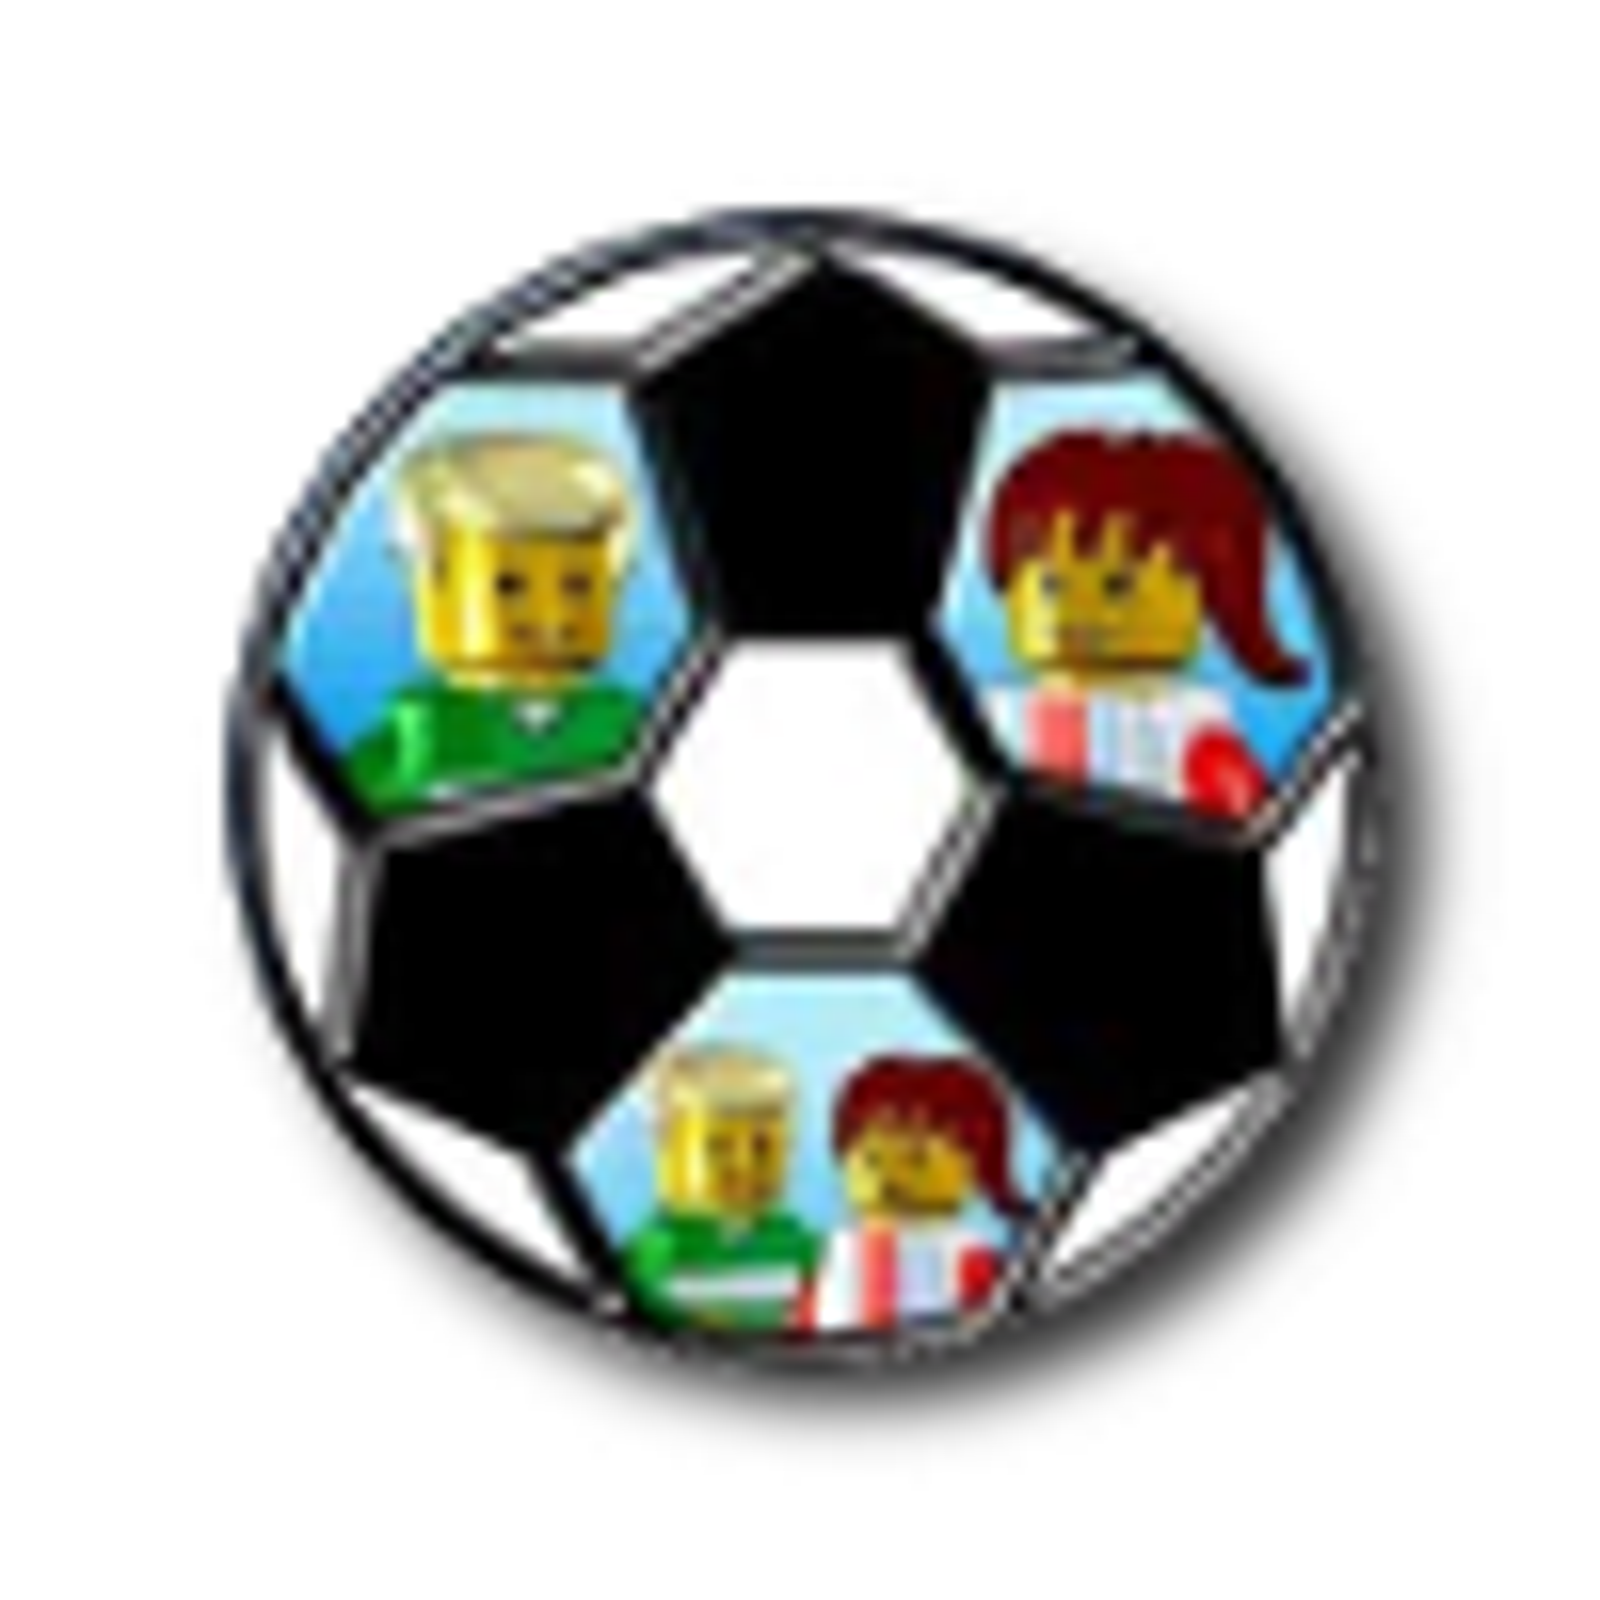 LEGO Desktop Footballer